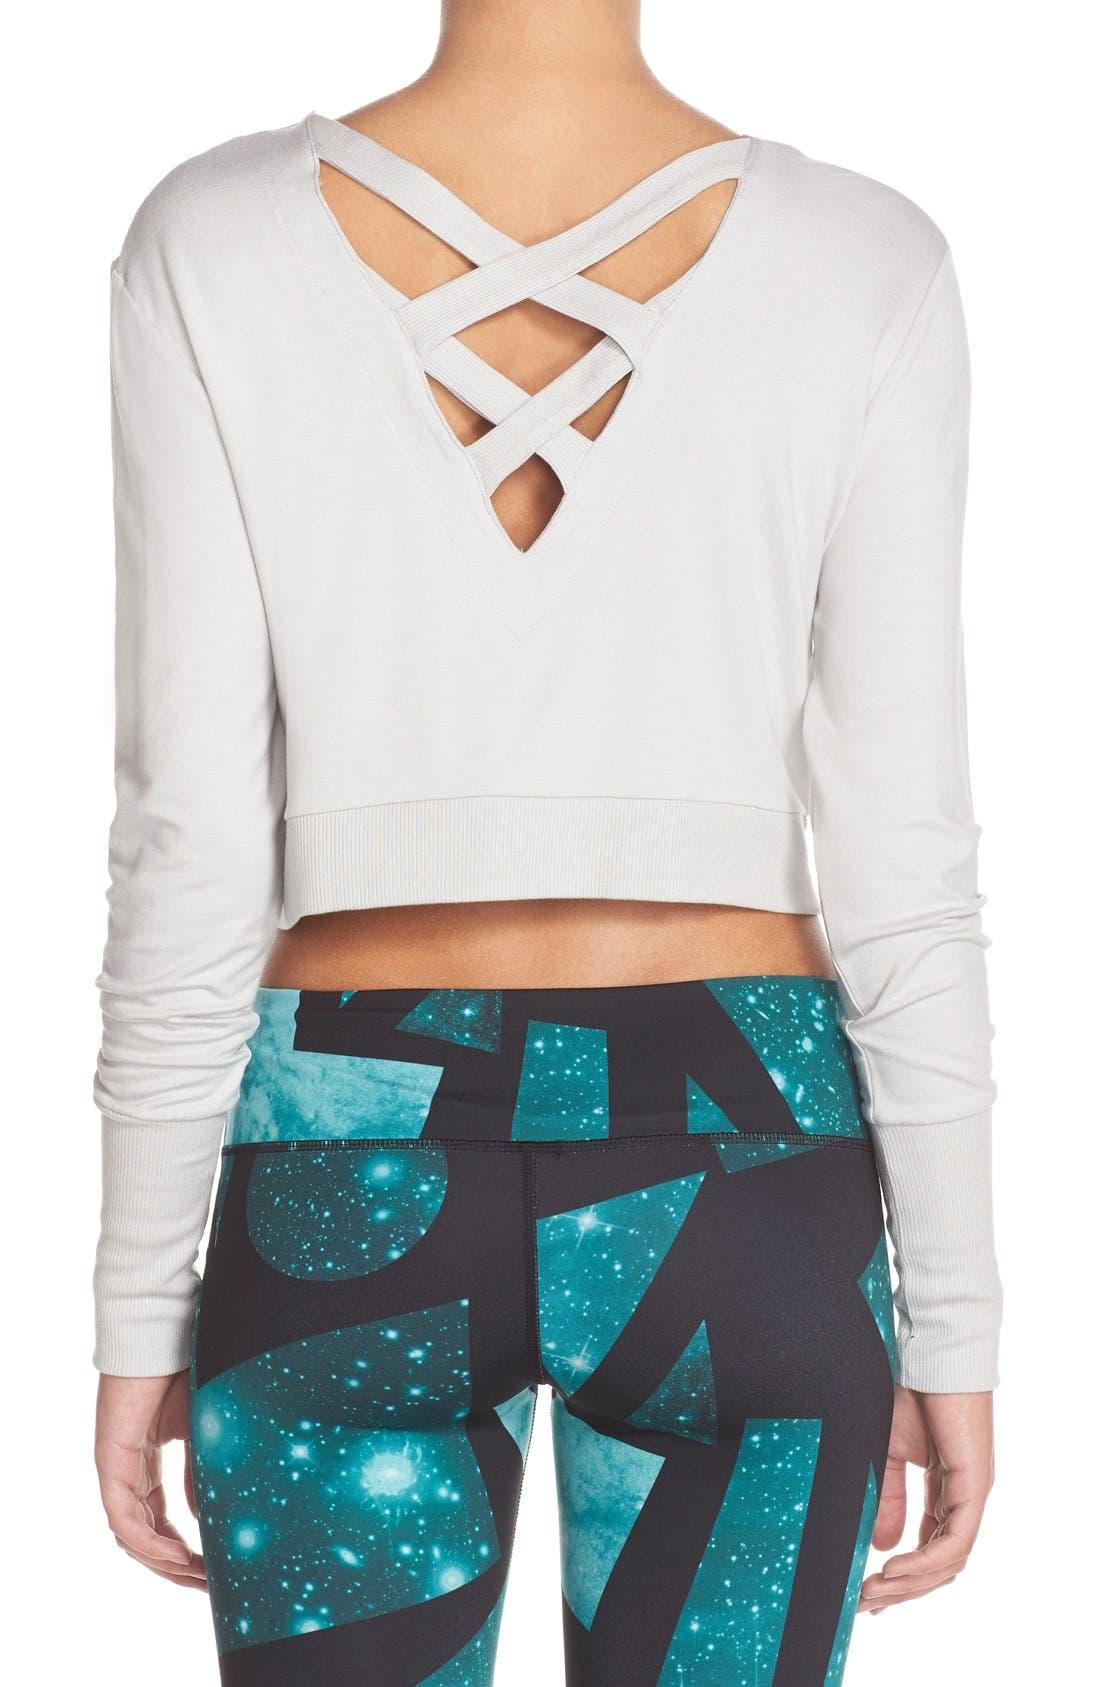 Alternate Image 1 Selected - Alo 'Ava' Cross Back Crop Sweater